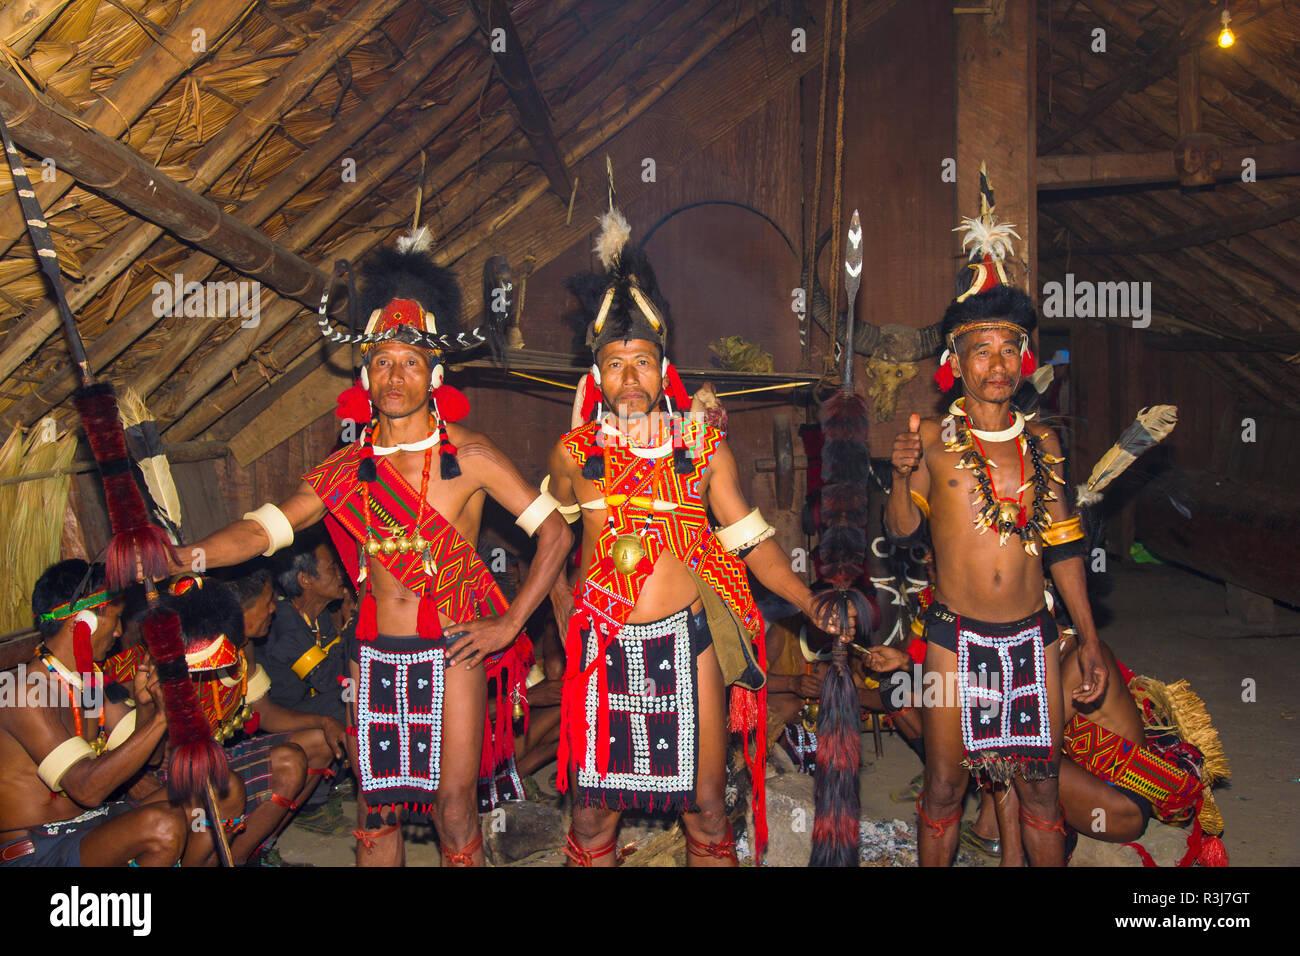 Naga tribal men in traditional clothing, Kisima Nagaland Hornbill festival, Kohima, Nagaland, India - Stock Image